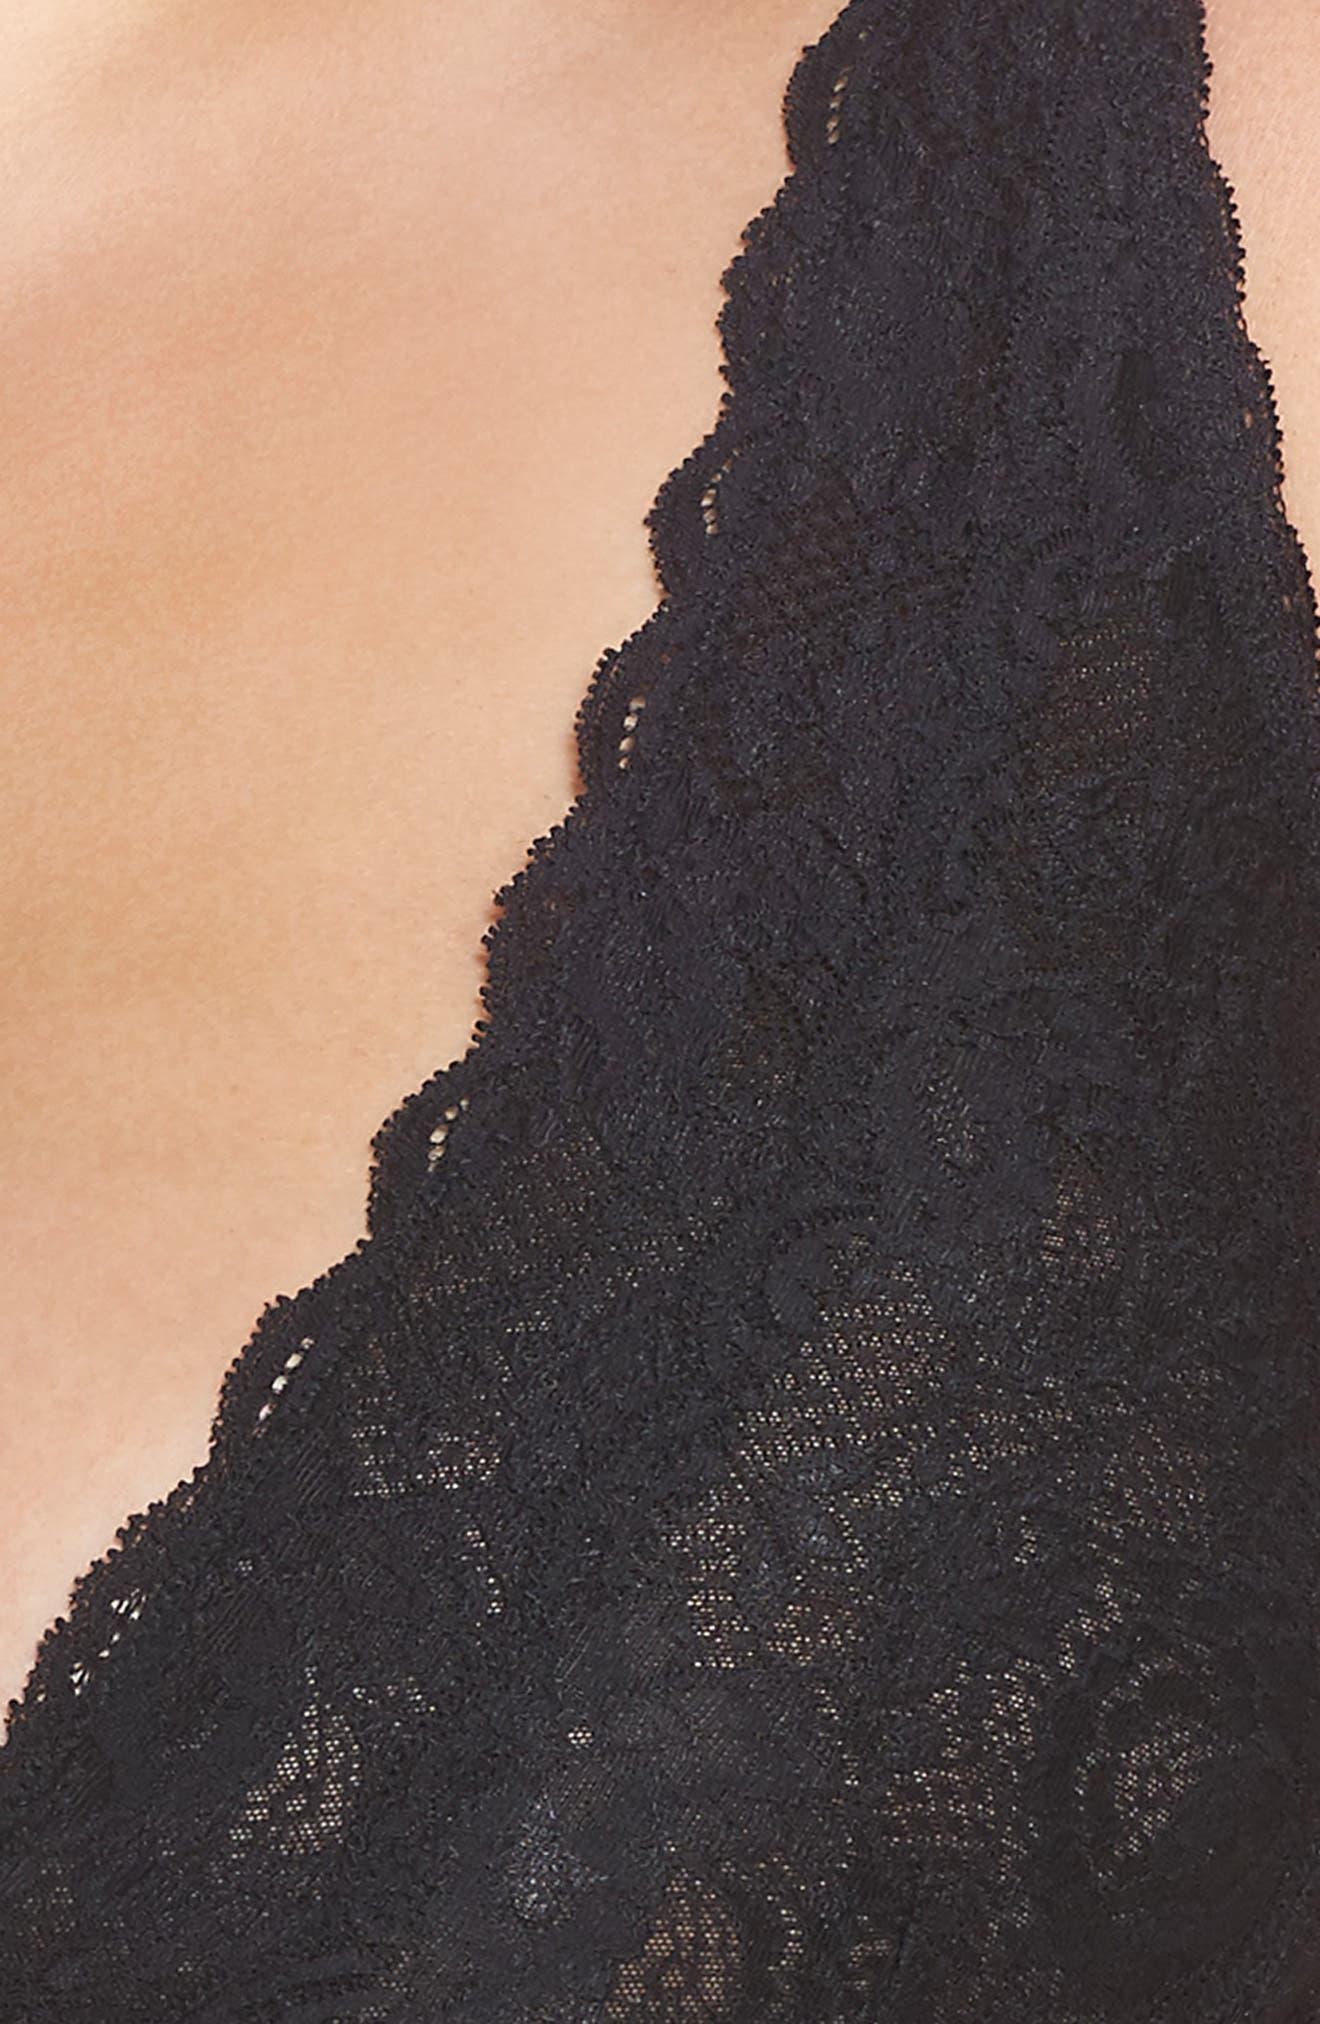 Never Say Never Plungie Lace Longline Bralette,                         Main,                         color, Black